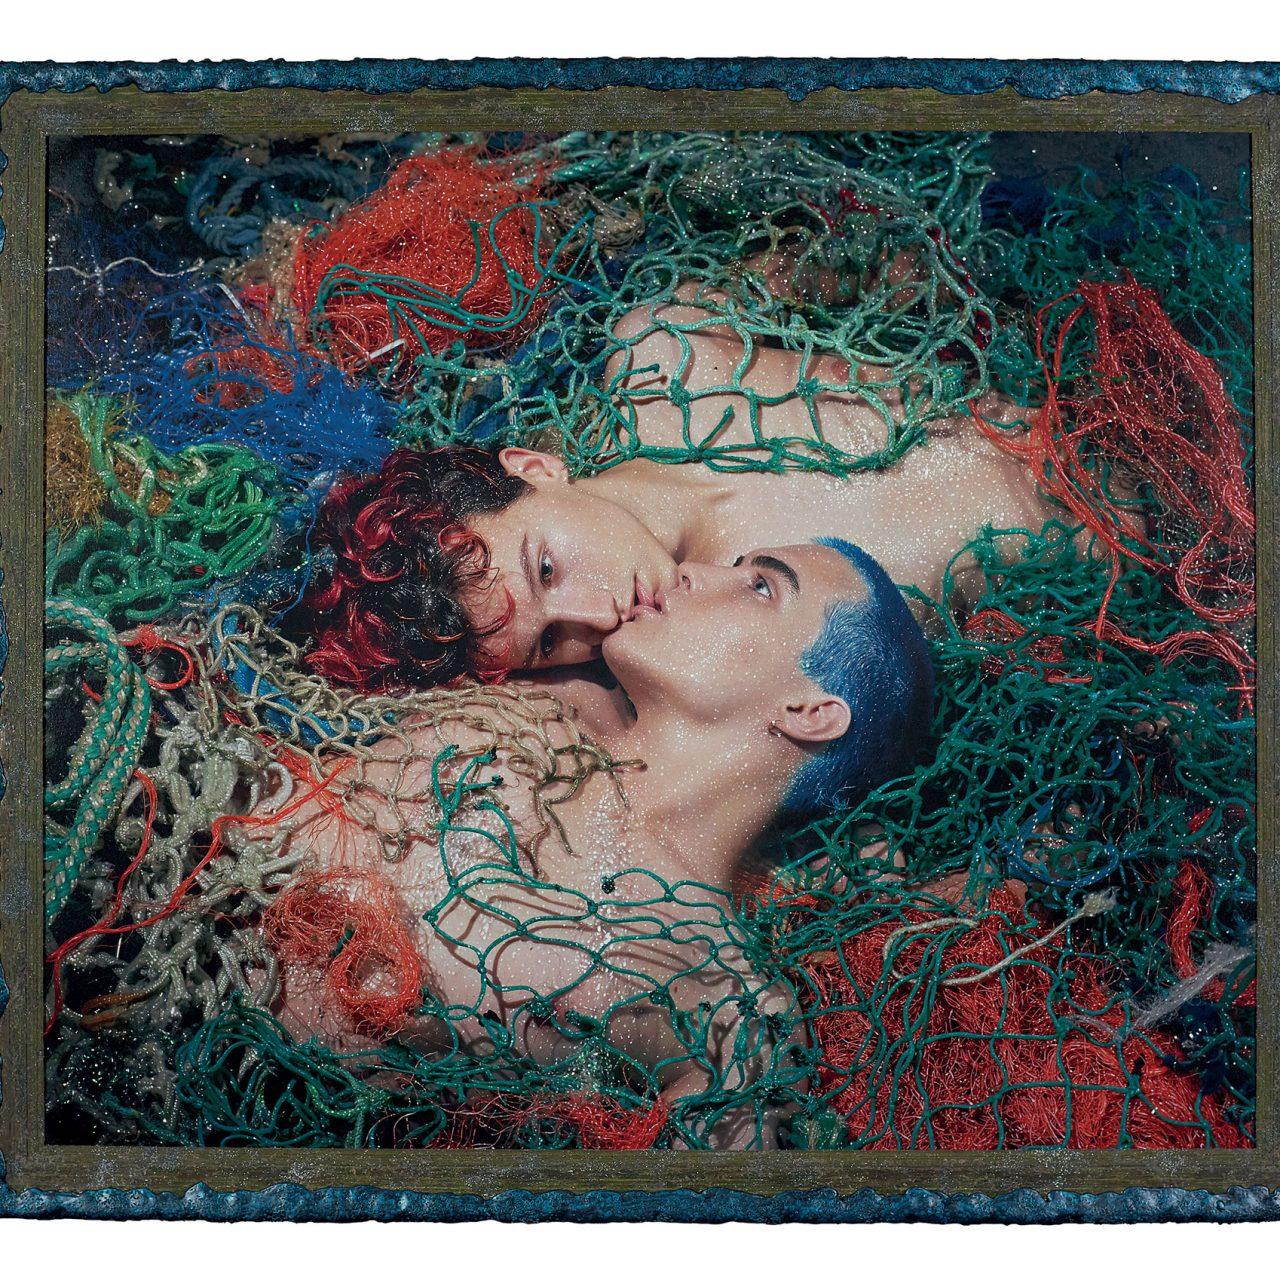 Pierre et Gilles Present Motionless Wanderings at Galerie Templon